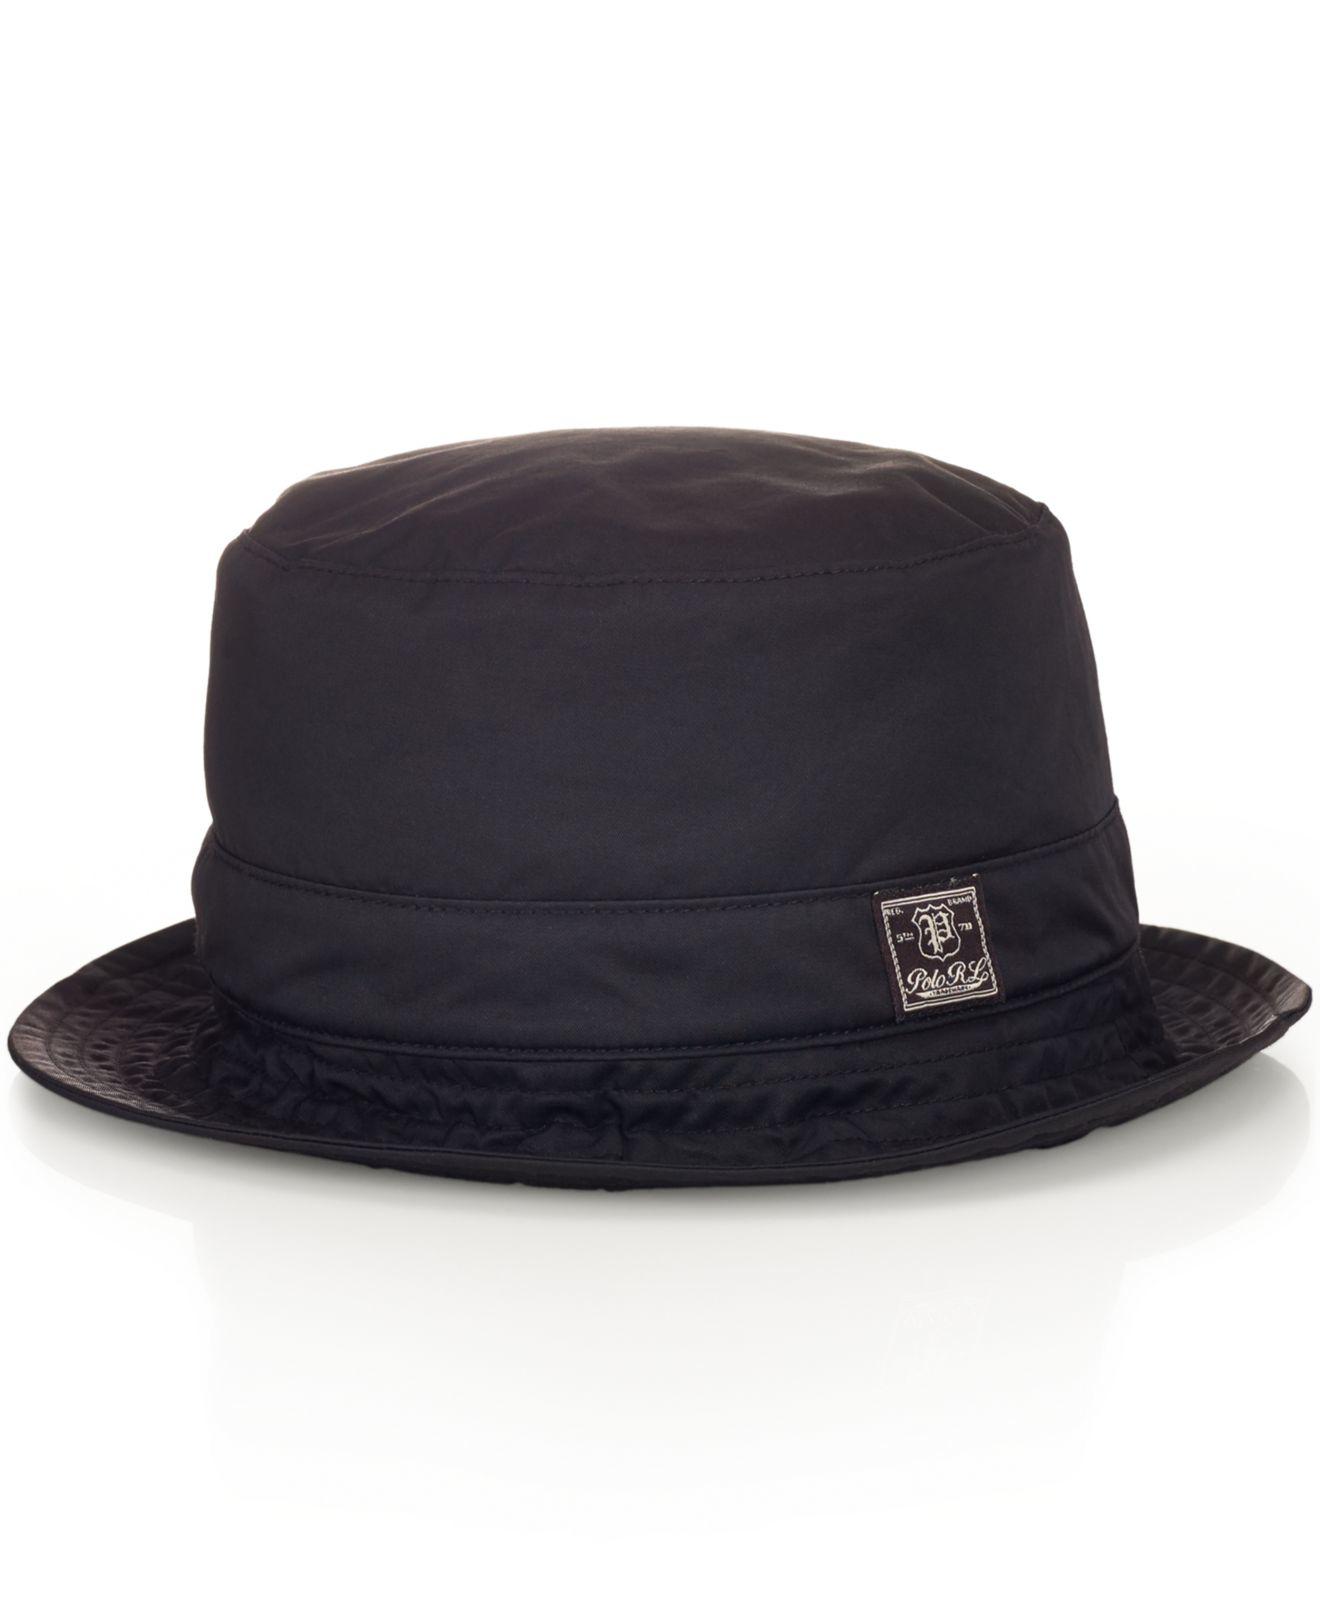 cc823e7e54d Lyst - Polo Ralph Lauren Twill Bucket Hat in Black for Men